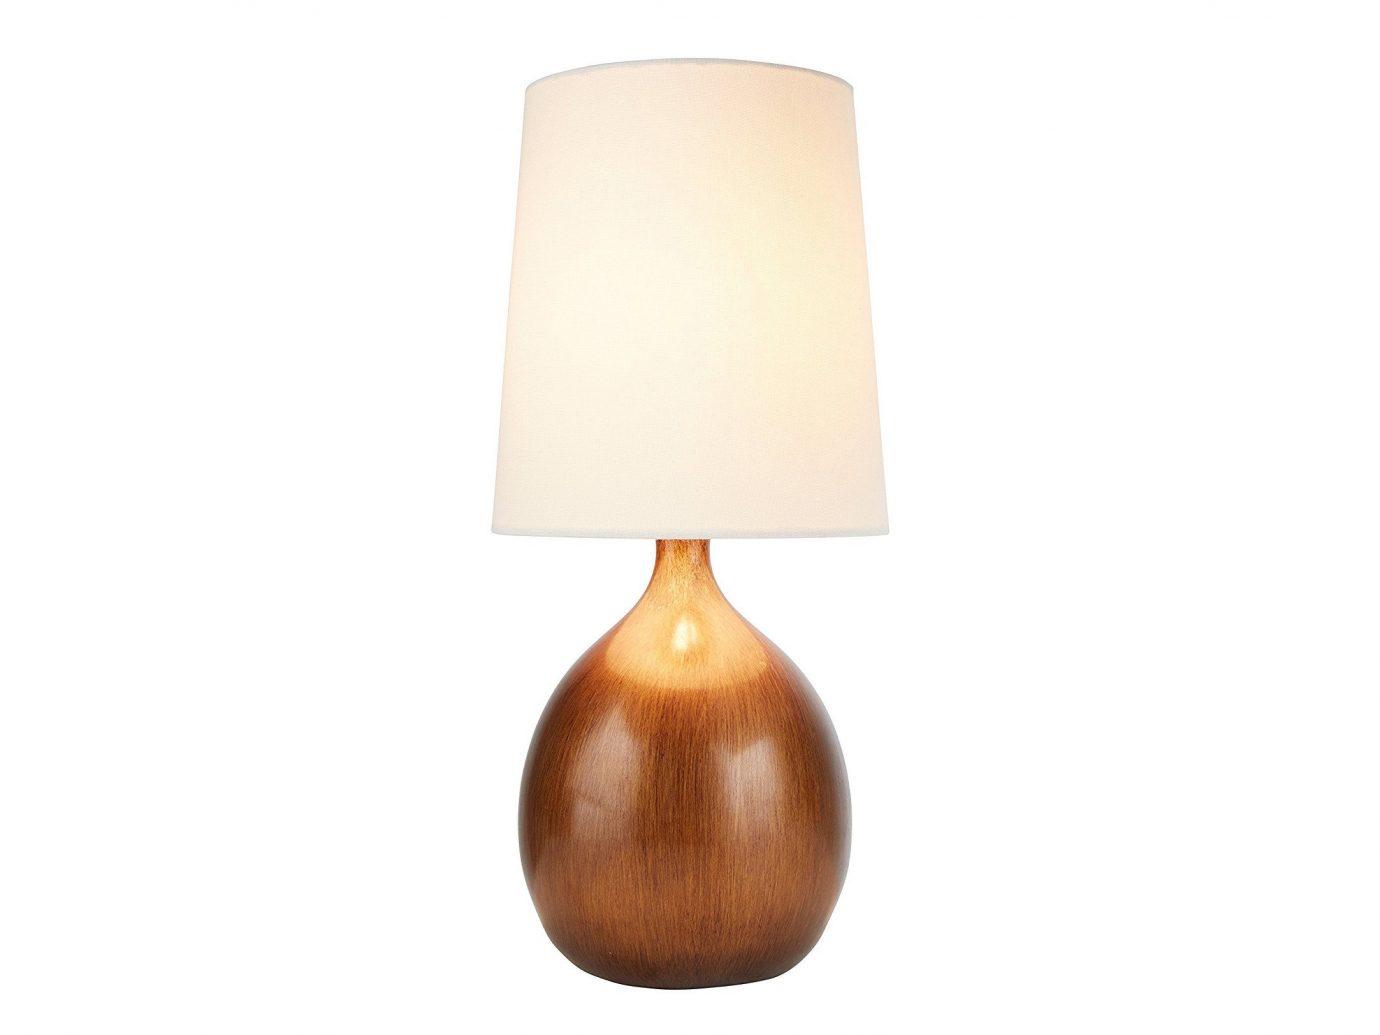 Amsterdam Style + Design The Netherlands Travel Shop indoor light fixture lighting lamp product design table lighting accessory ceiling fixture